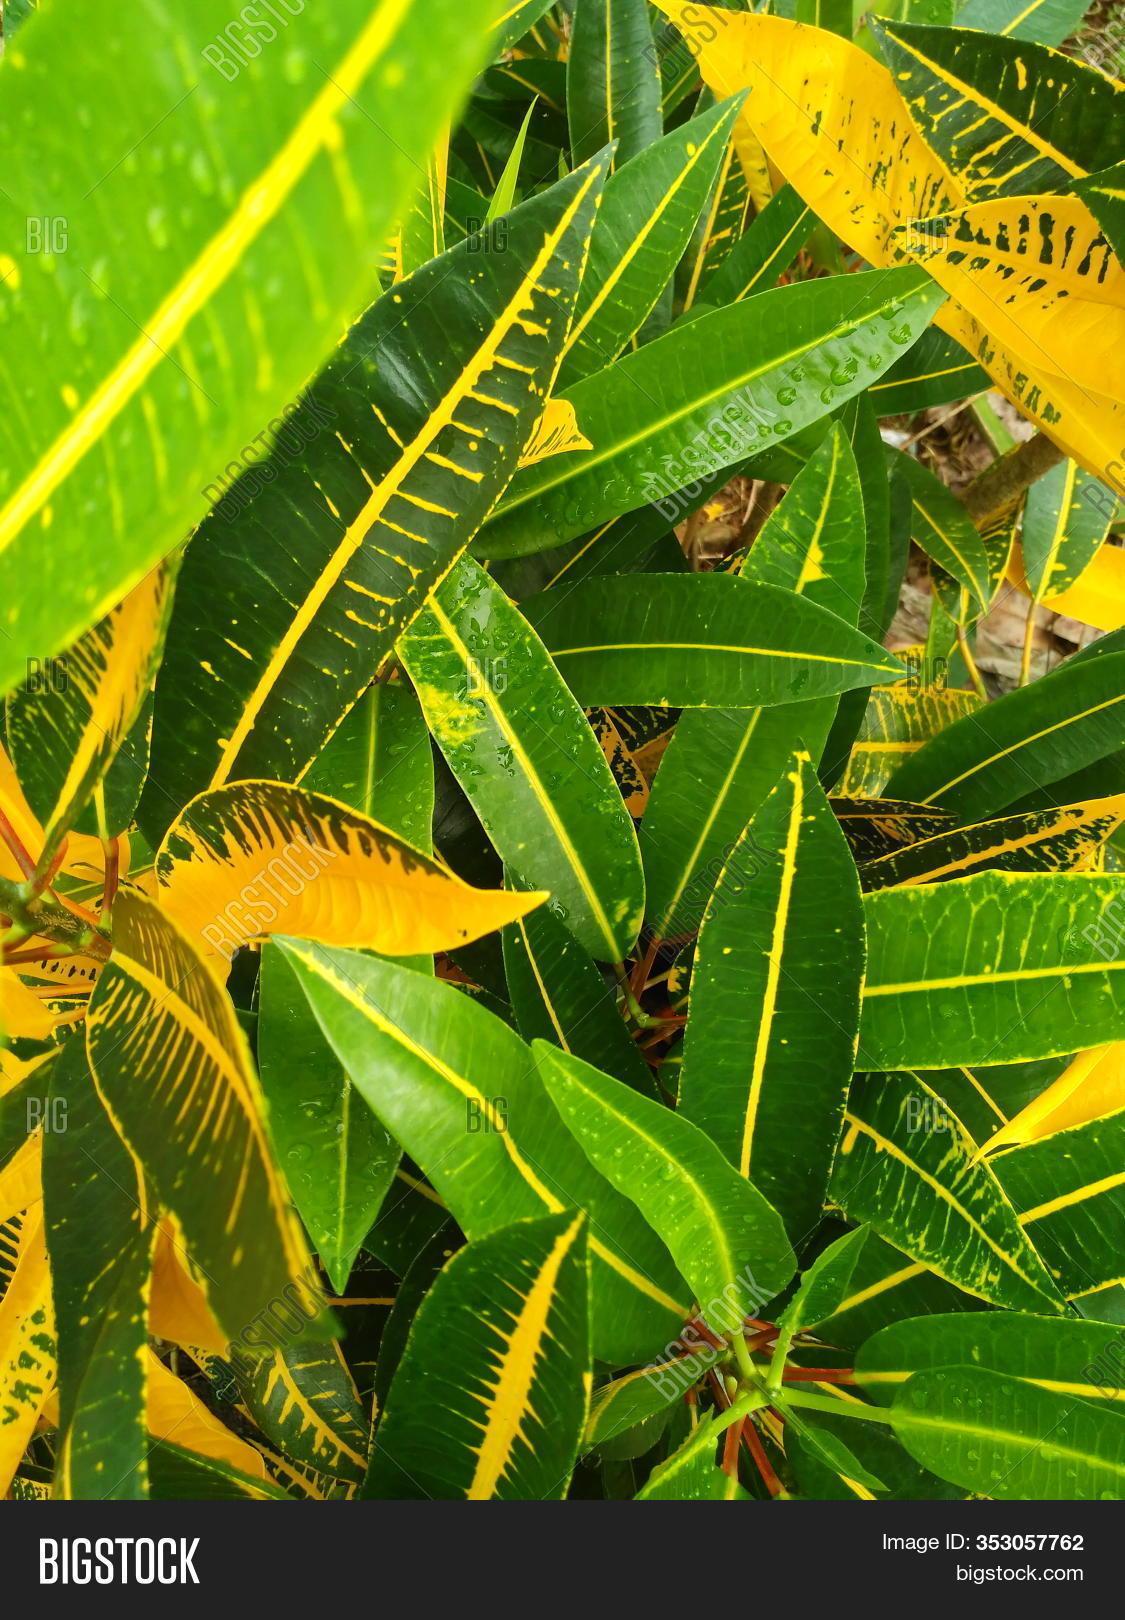 Green Leaf Leaf Image Photo Free Trial Bigstock Download transparent tropical leaves png for free on pngkey.com. green leaf leaf image photo free